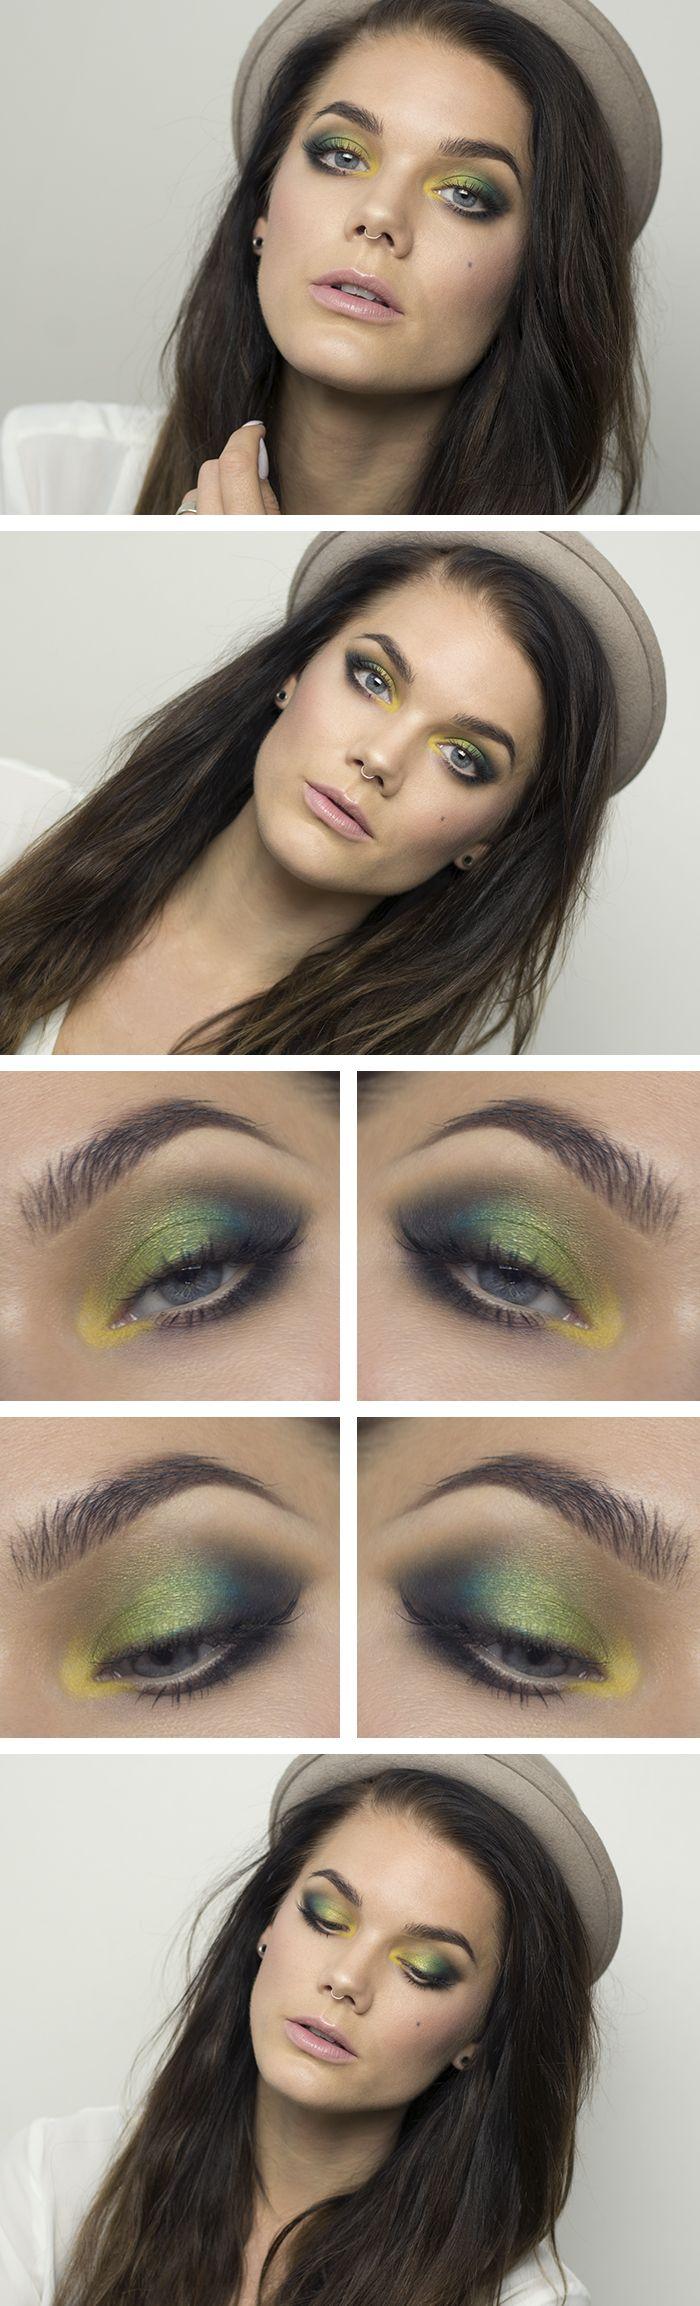 Linda Hallberg - Make-up Look - 13-6-2014